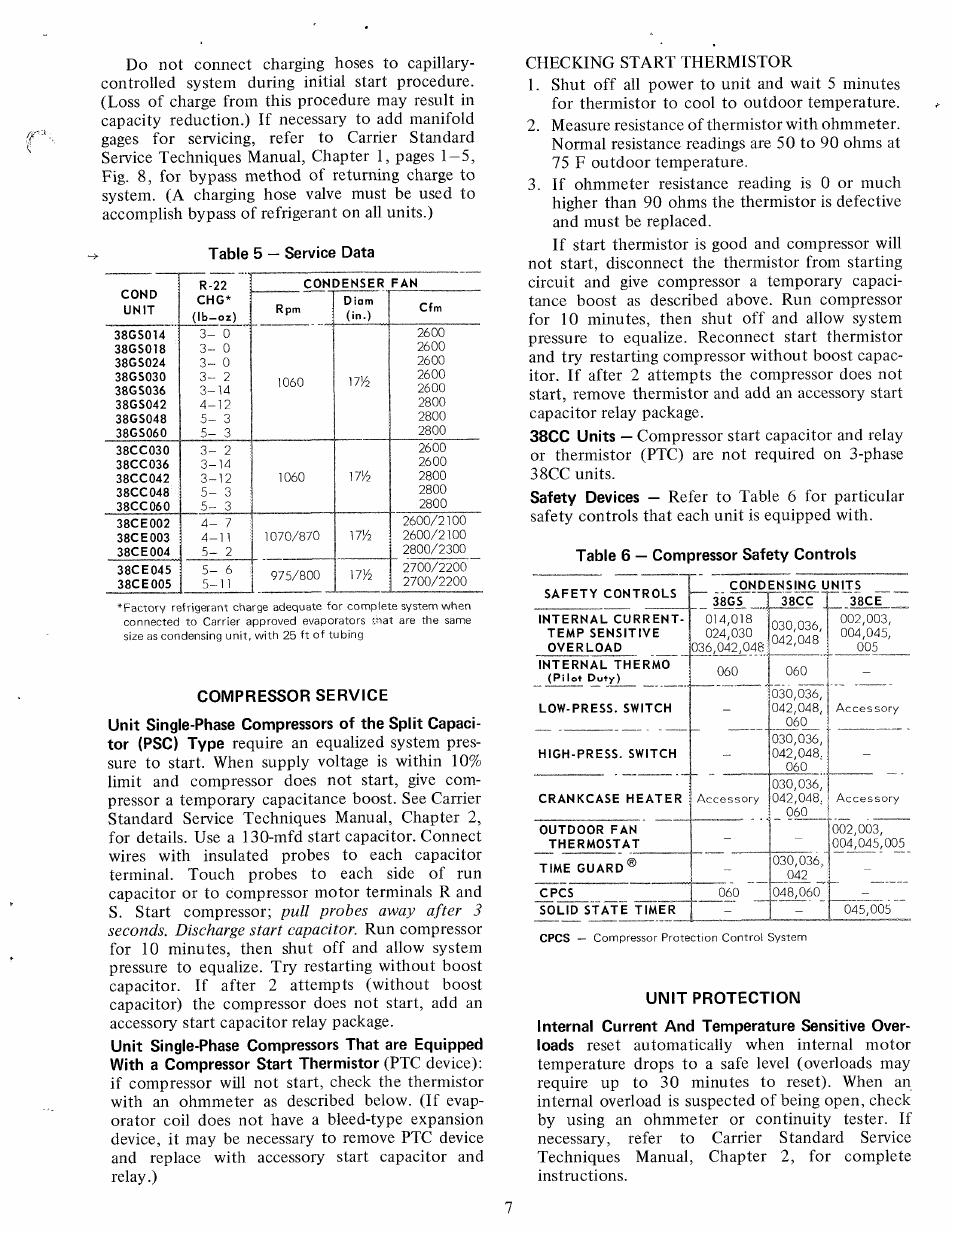 compressor service unit protection carrier 38gs user manual rh manualsdir com Carrier 58MXA Carrier Thermostat Manual